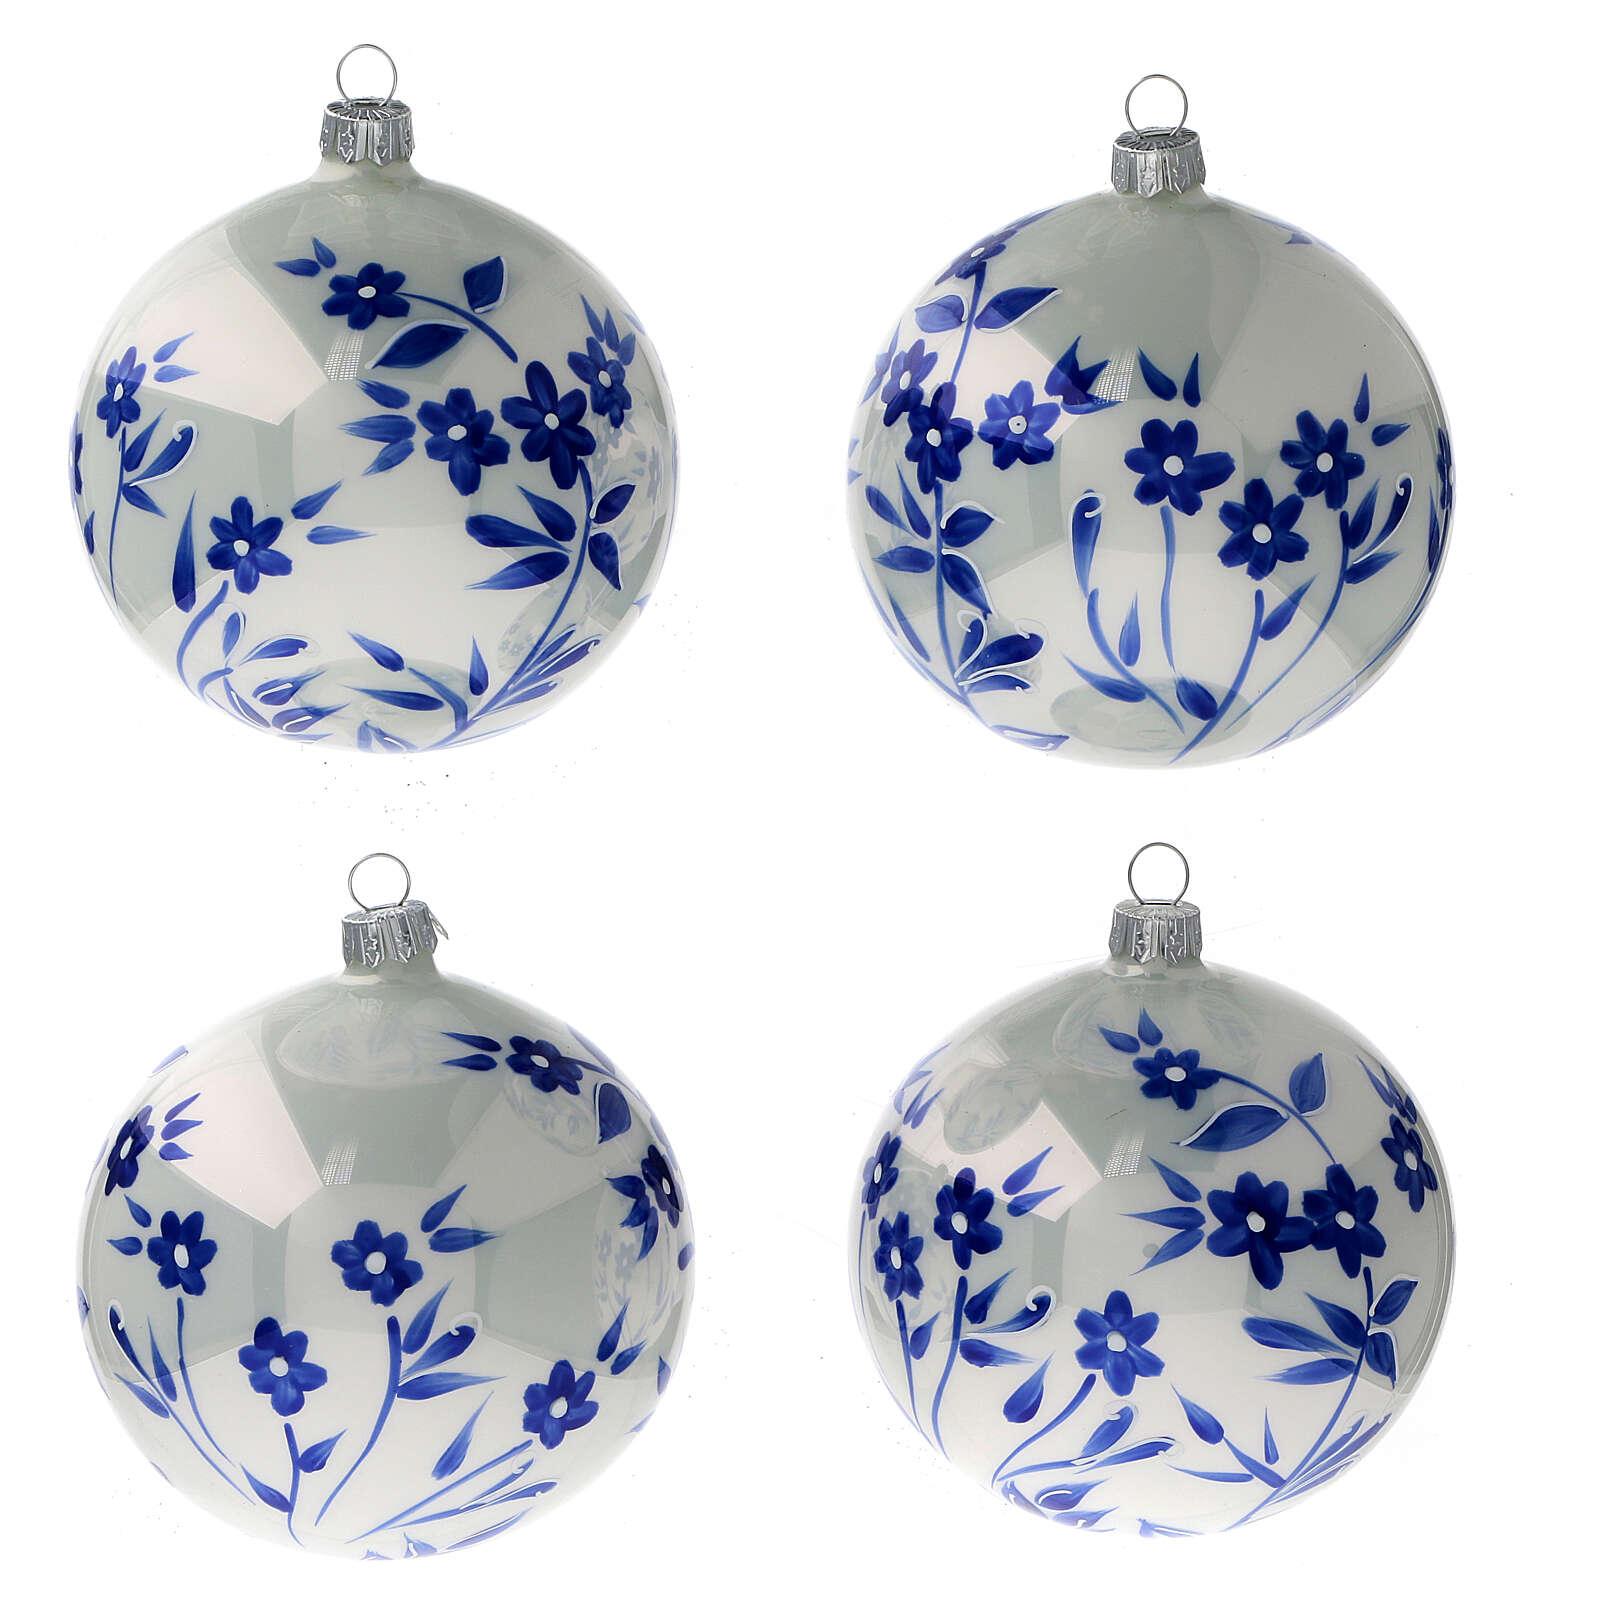 Pallina Natale bianca fiori blu stilizzati vetro soffiato 100 mm 4 pz 4